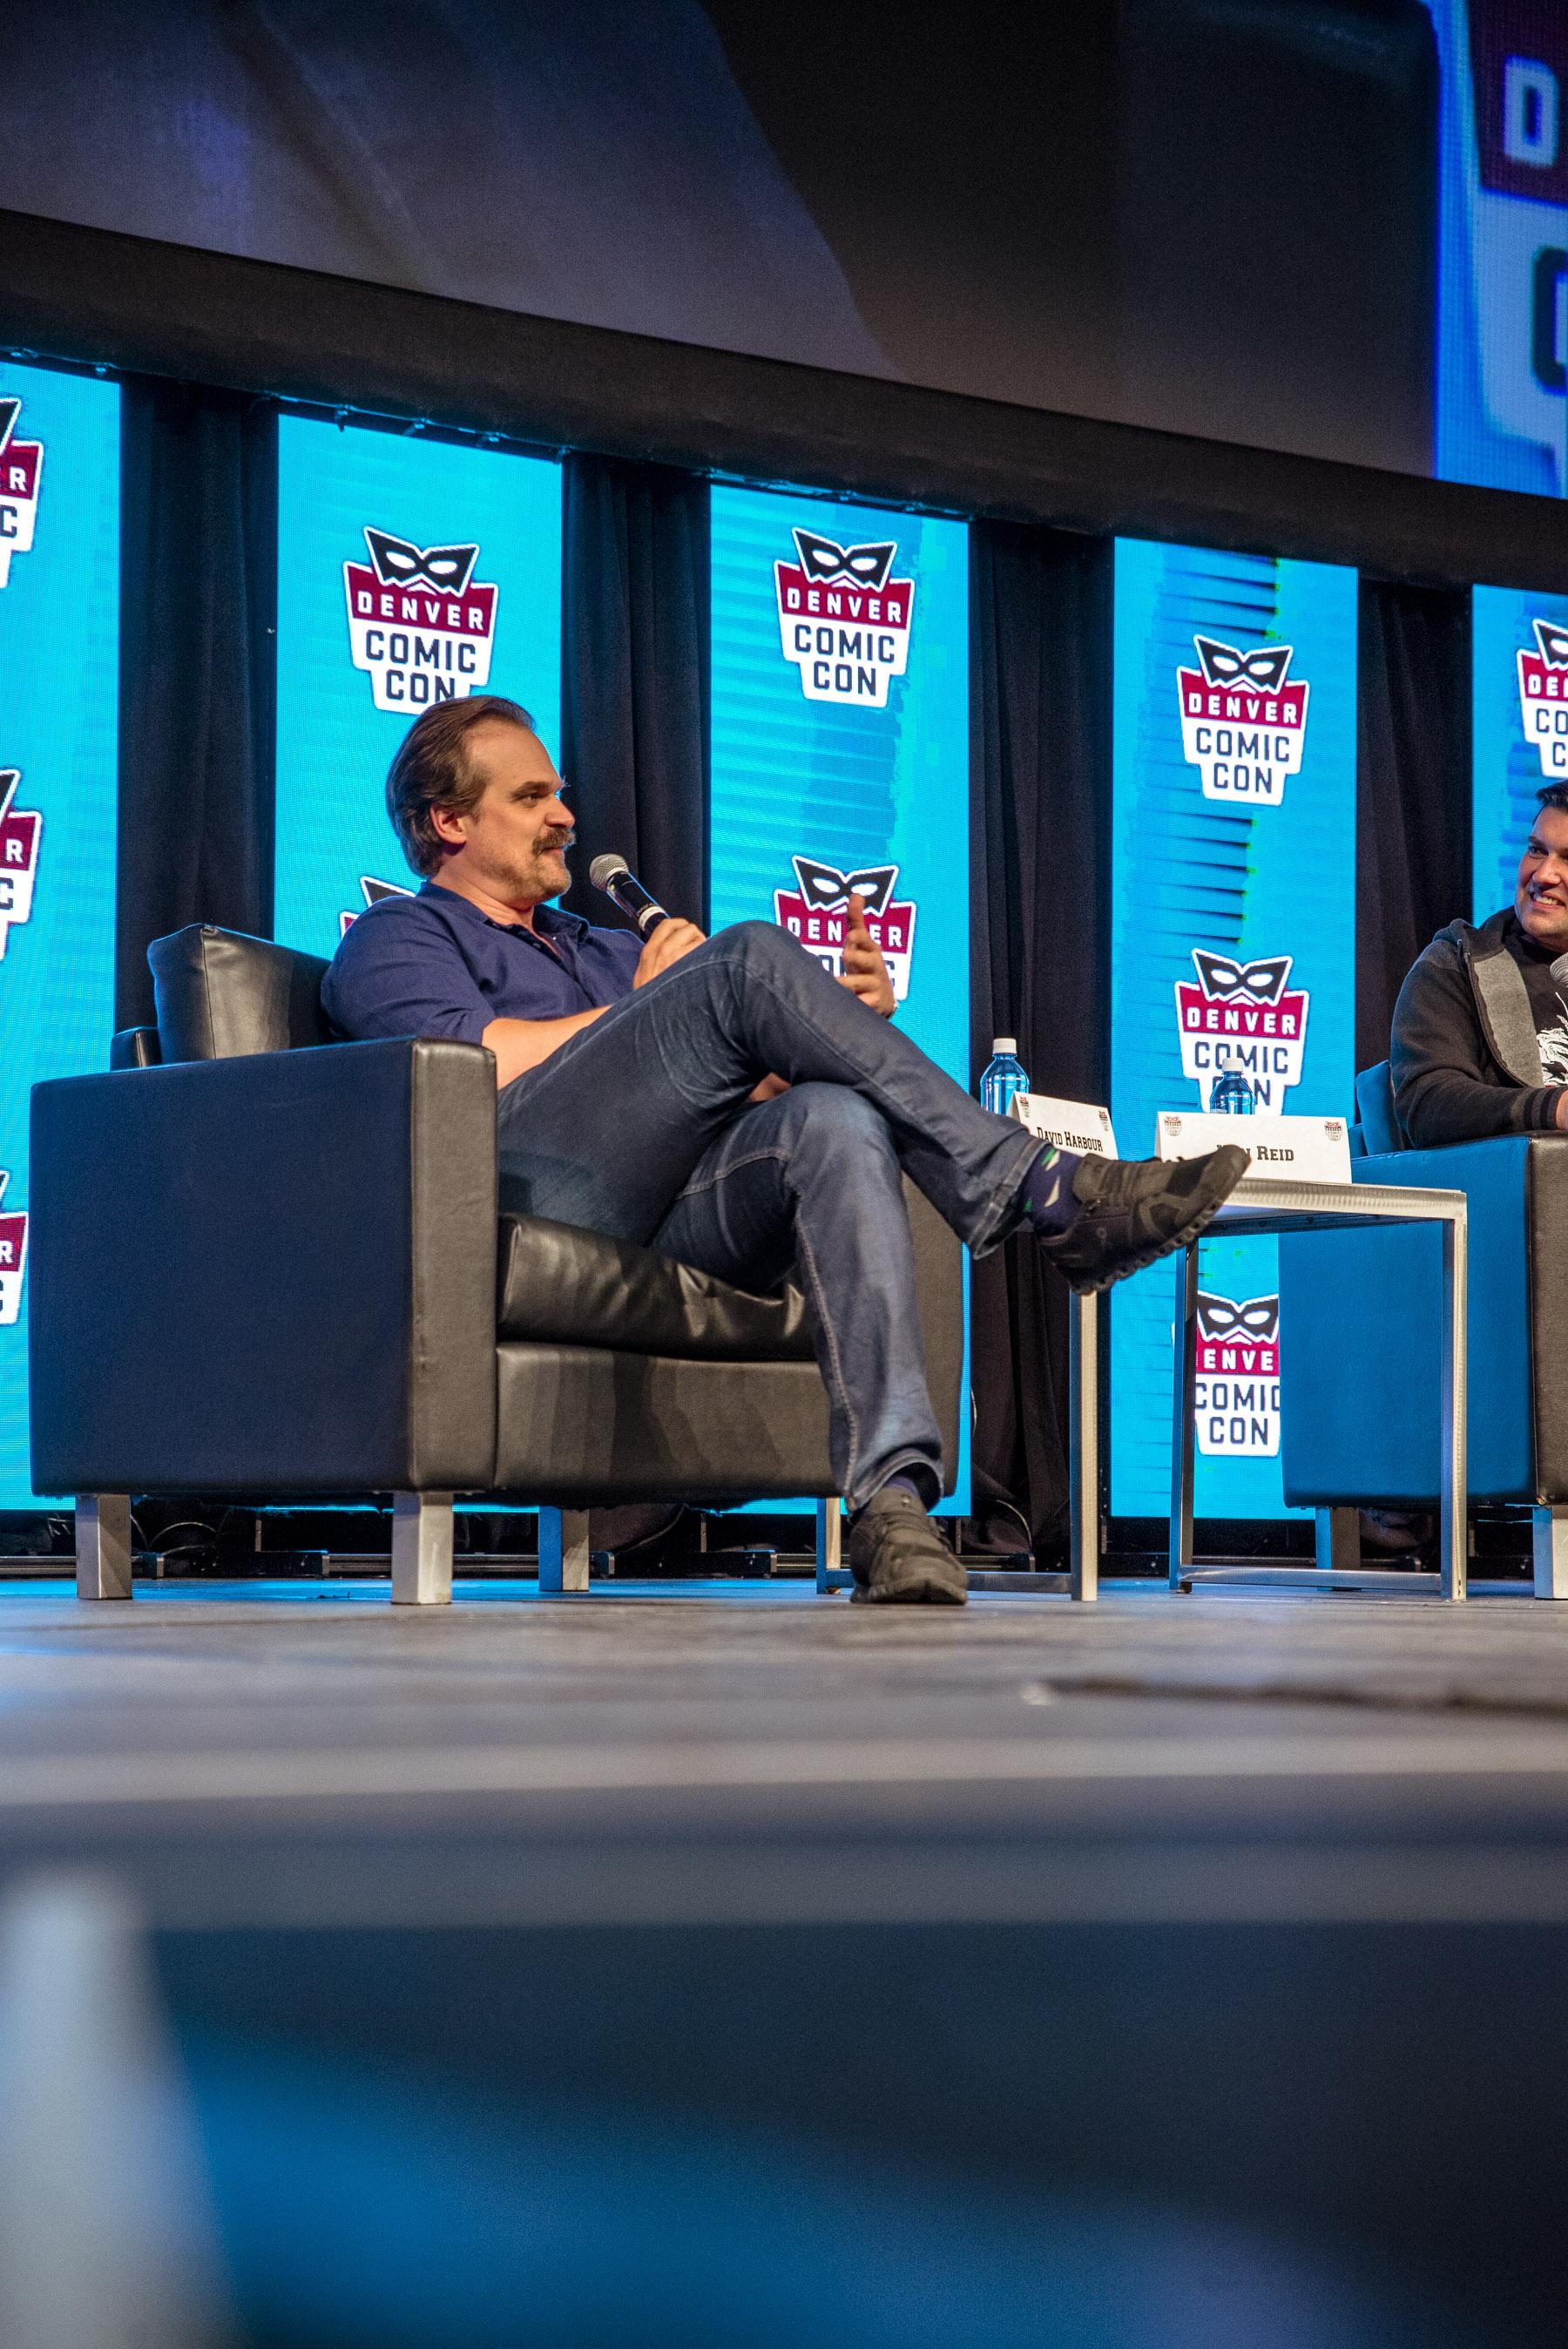 Comic Con 2018_AustinVoldseth-14.jpg